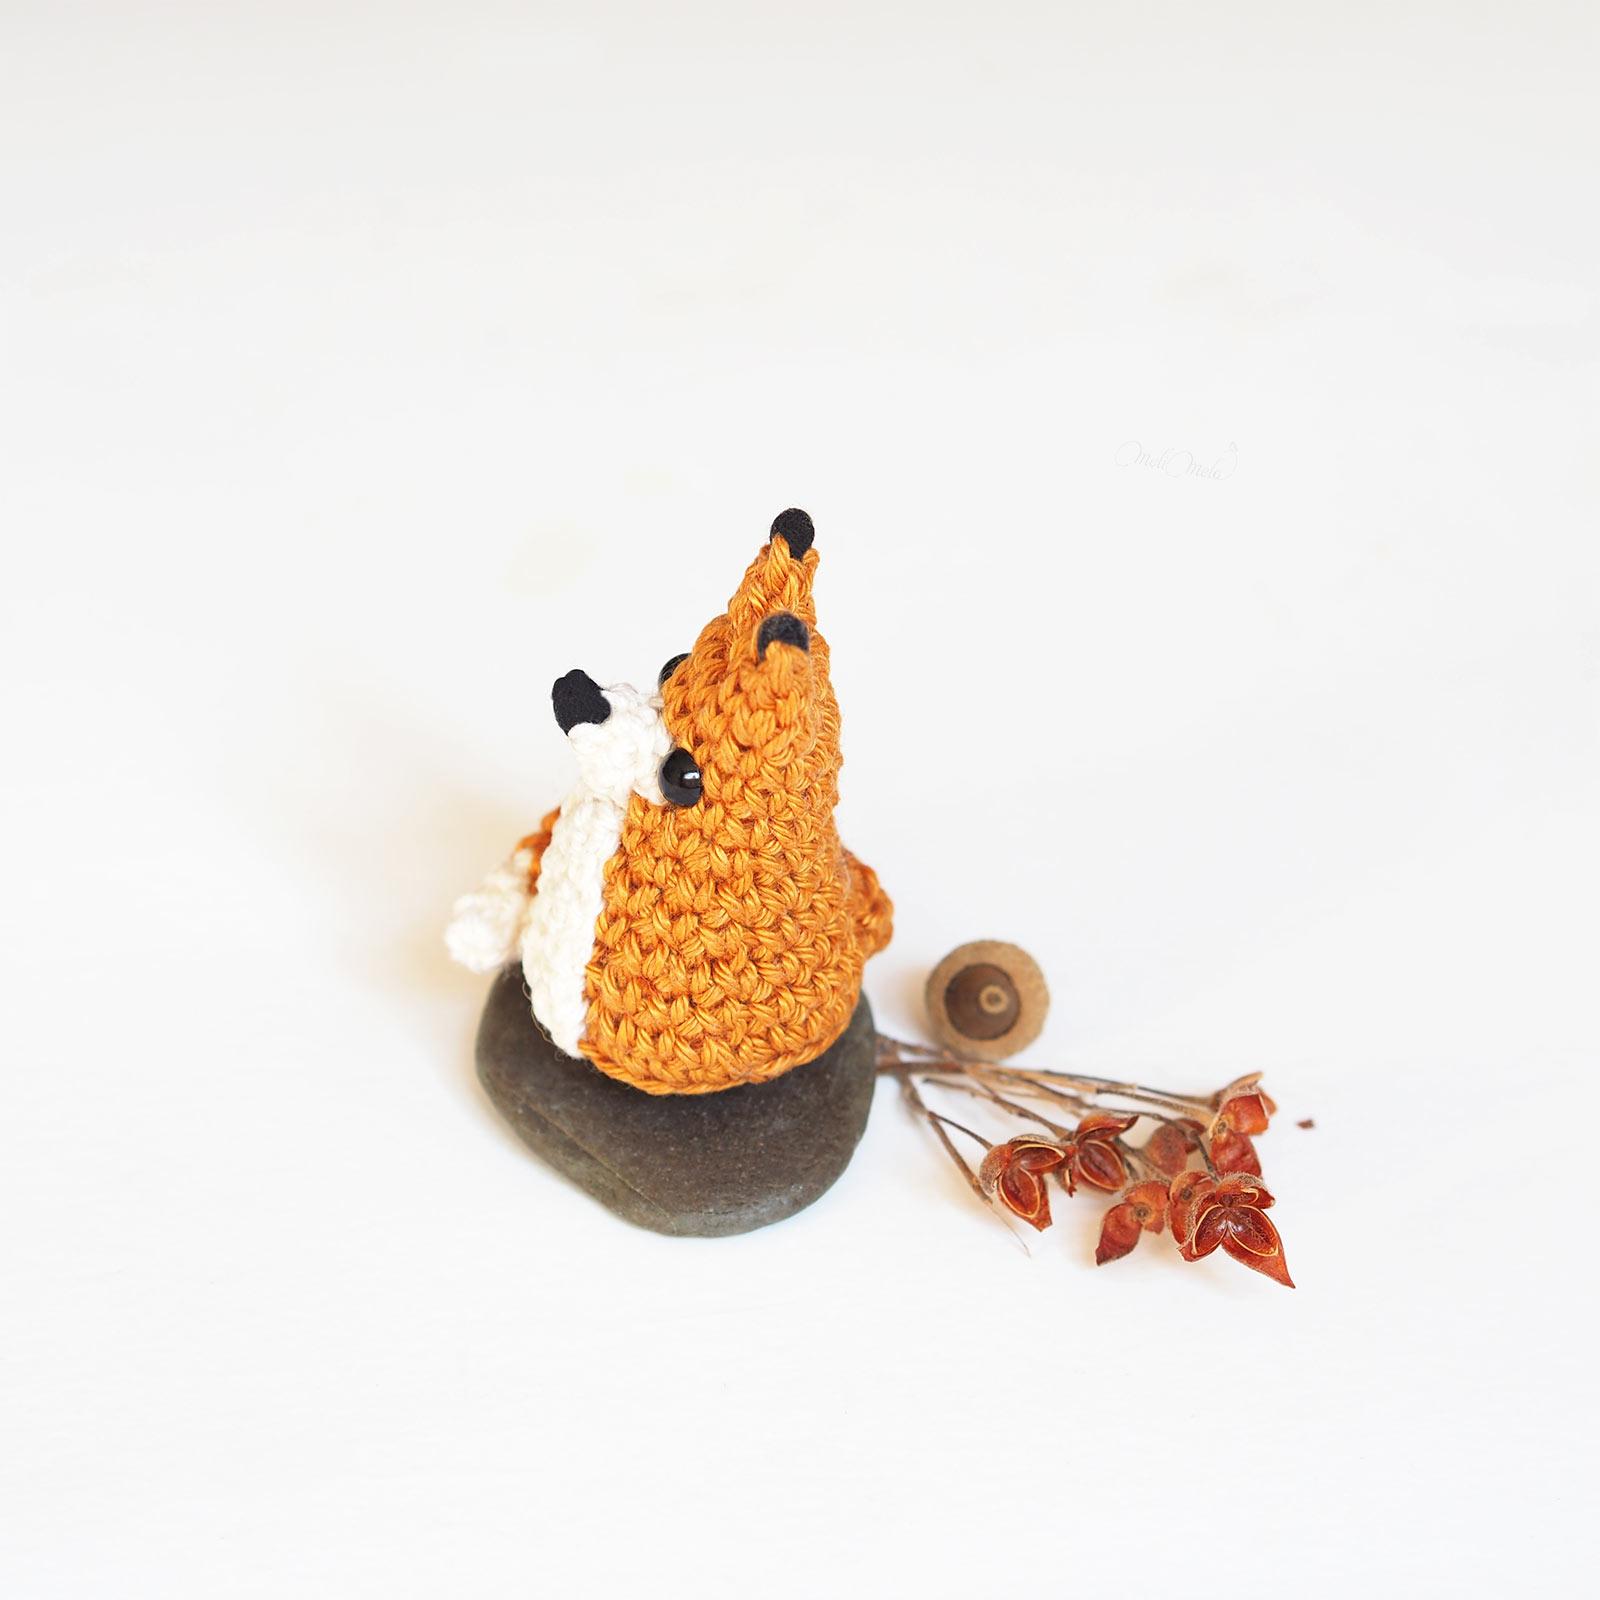 crochet mini renard roux tiny fox tuto DIY Catona Scheepjes profil laboutiquedemelimelo